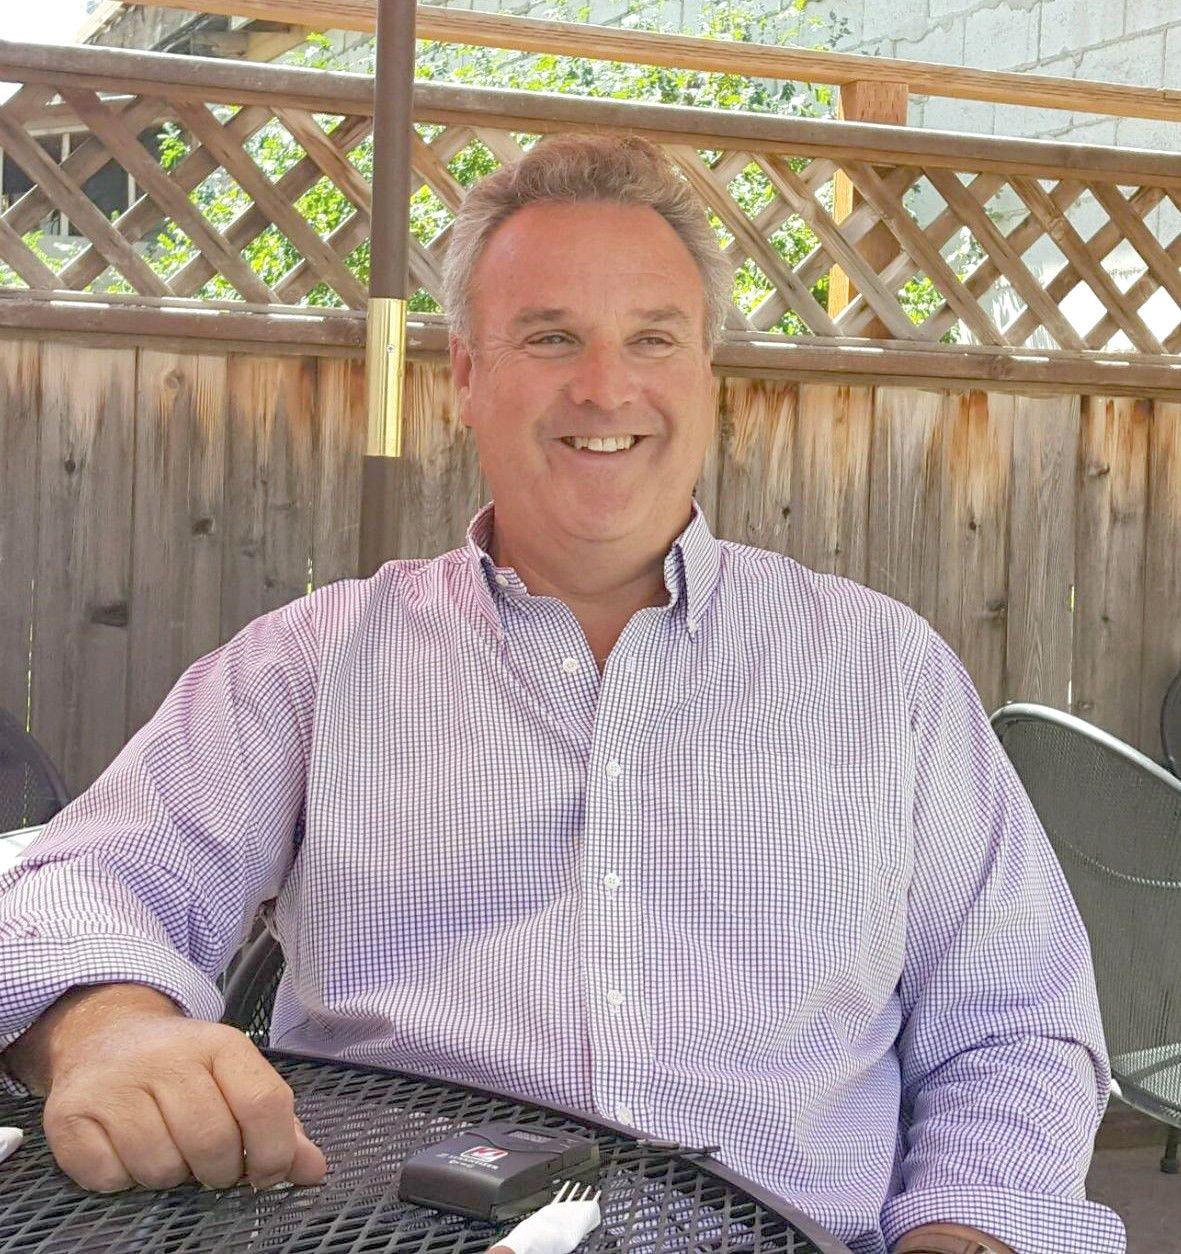 Sandfire America CEO, John G. Shanahan